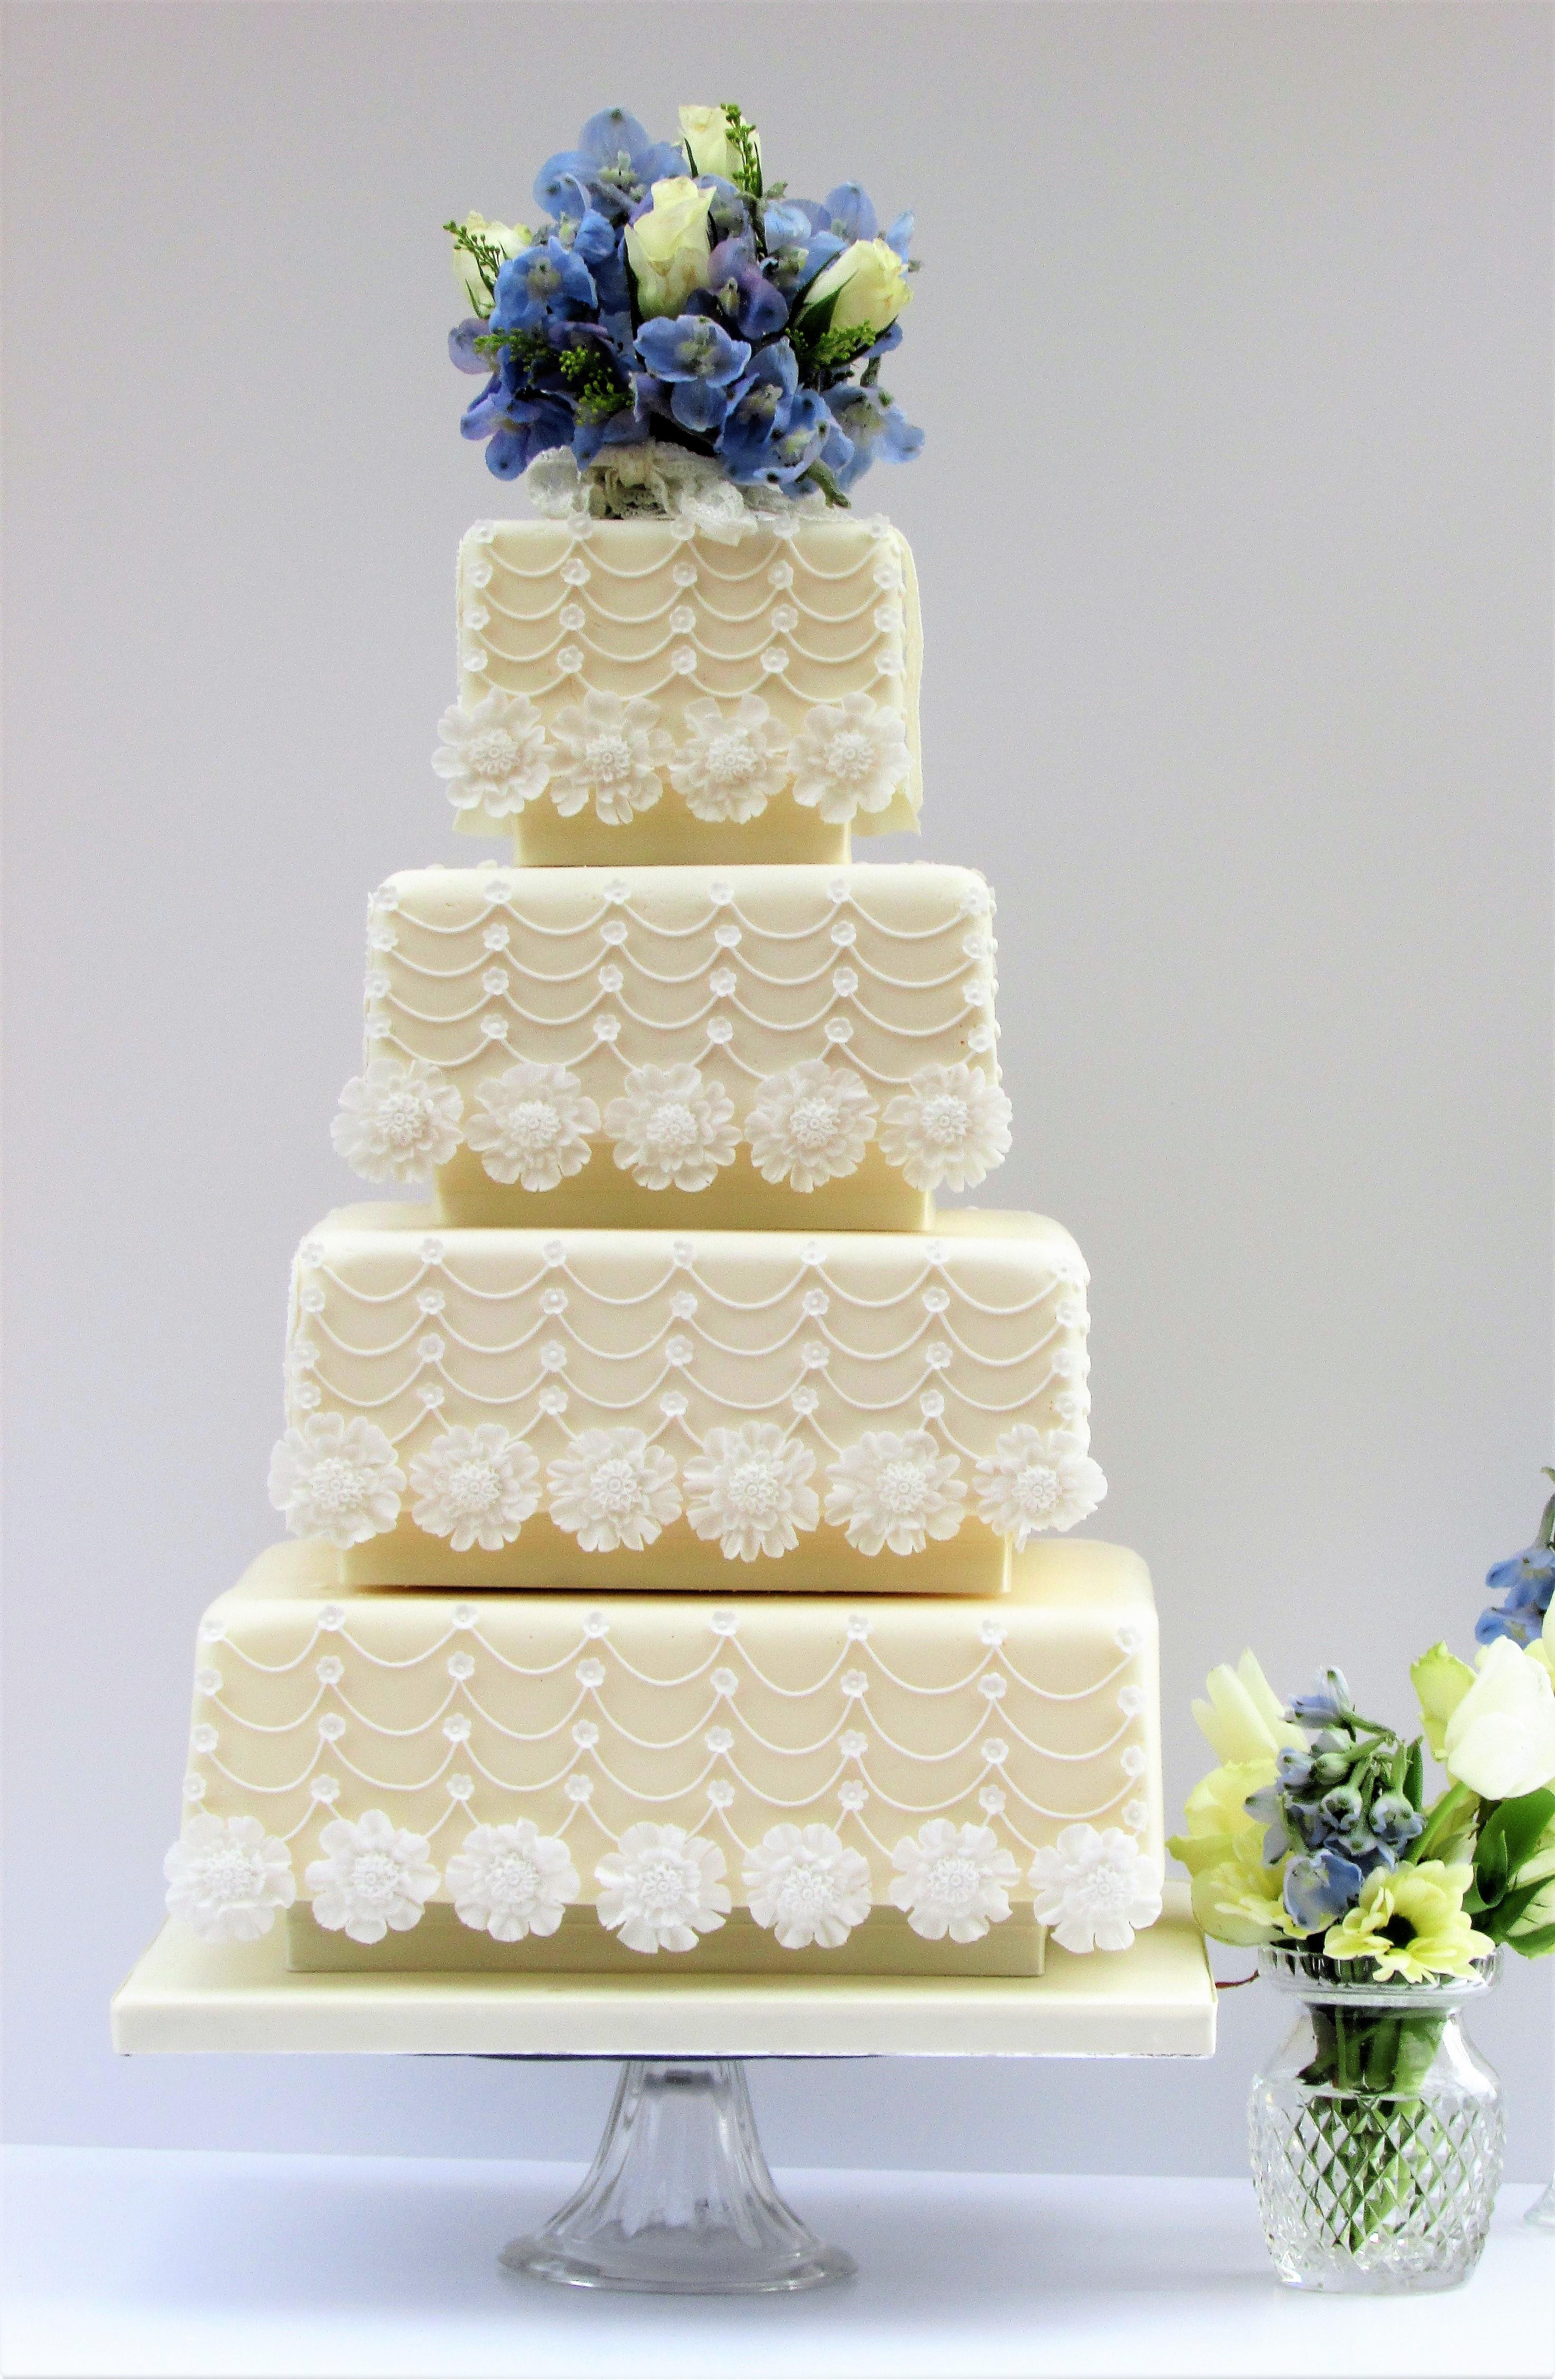 Tiered cream wedding cake with sugar flowers